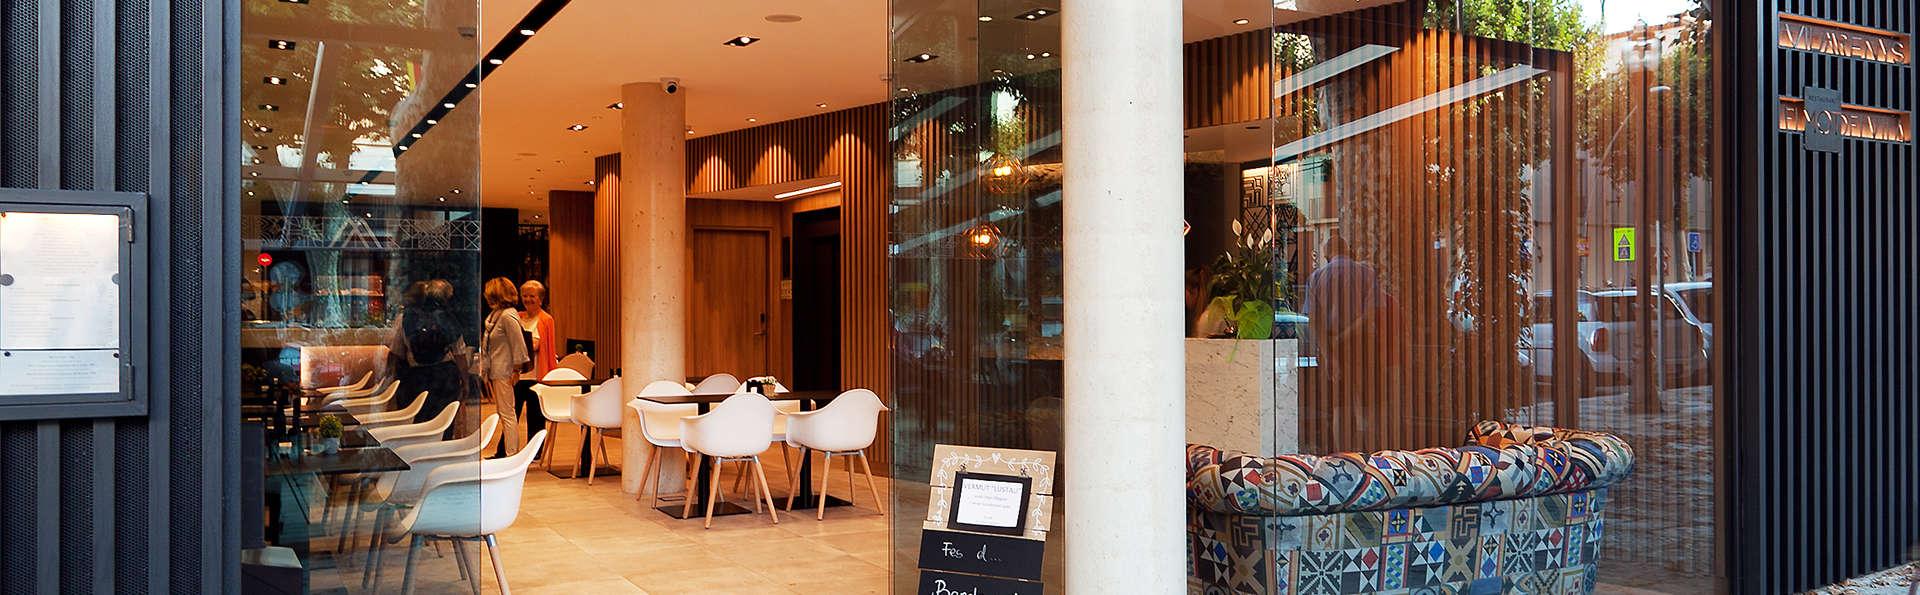 Vila Arenys Hotel - Edit_Front2.jpg